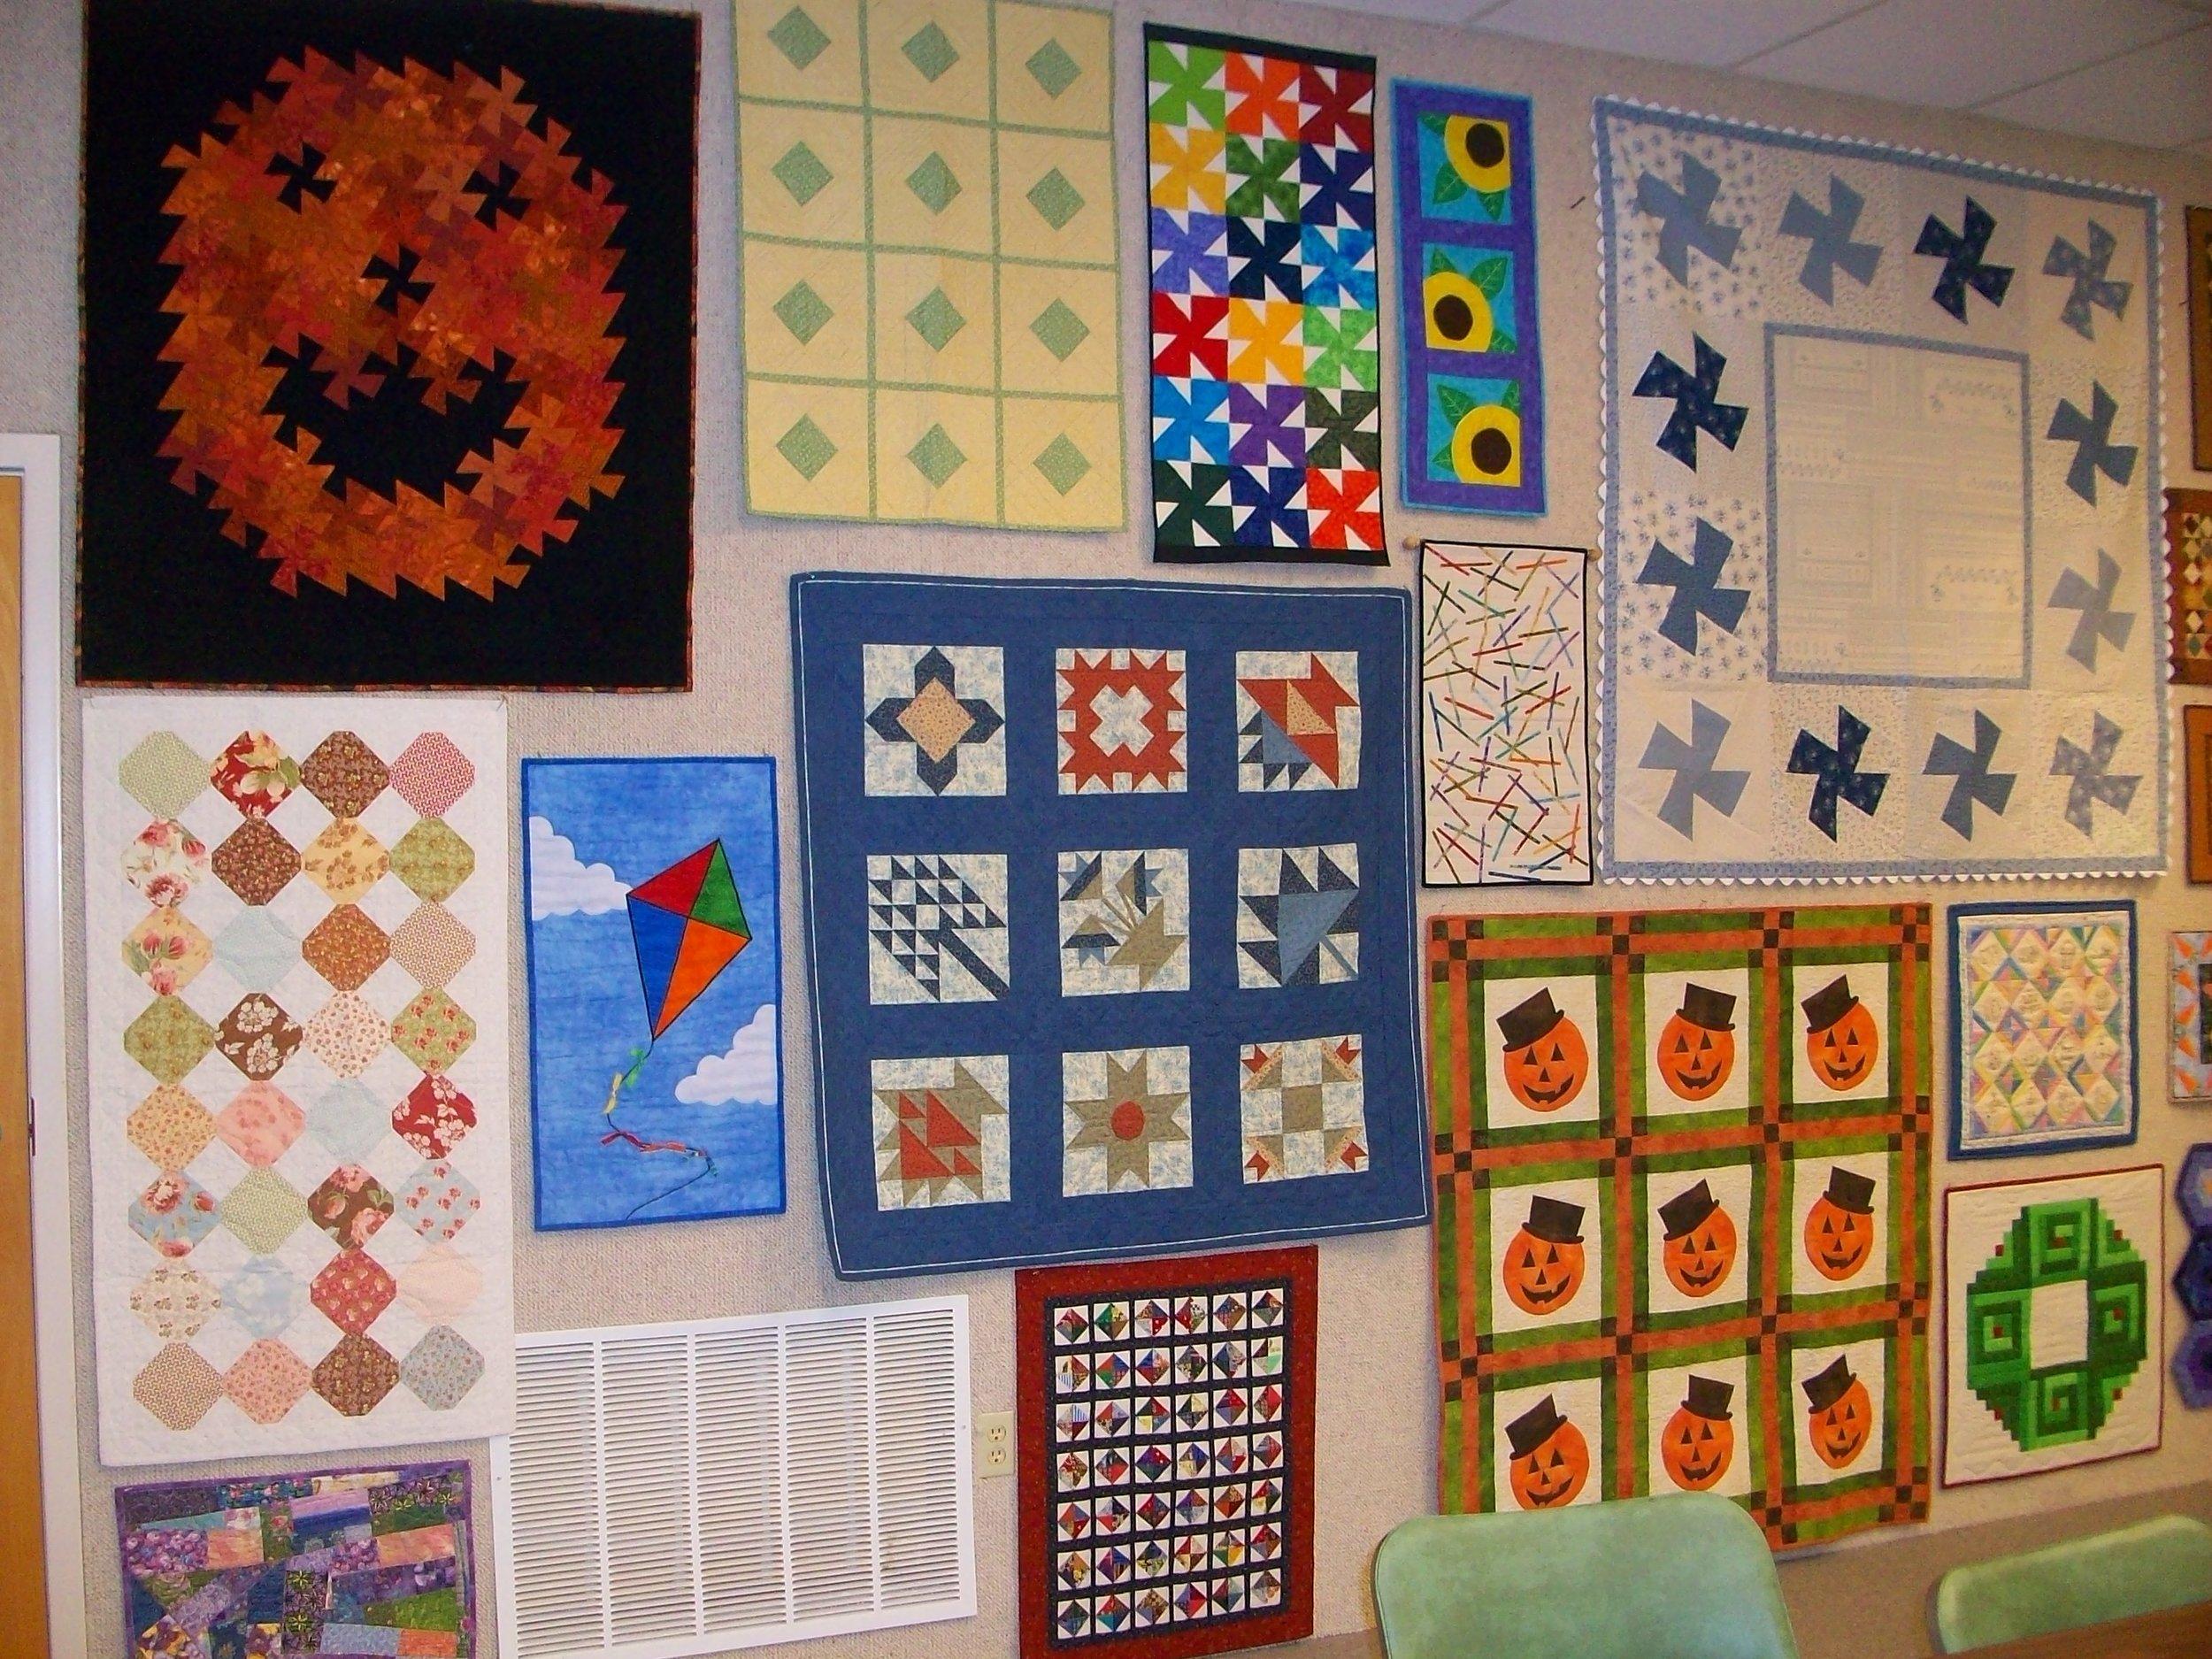 quilt exhibit 2015 012.jpg